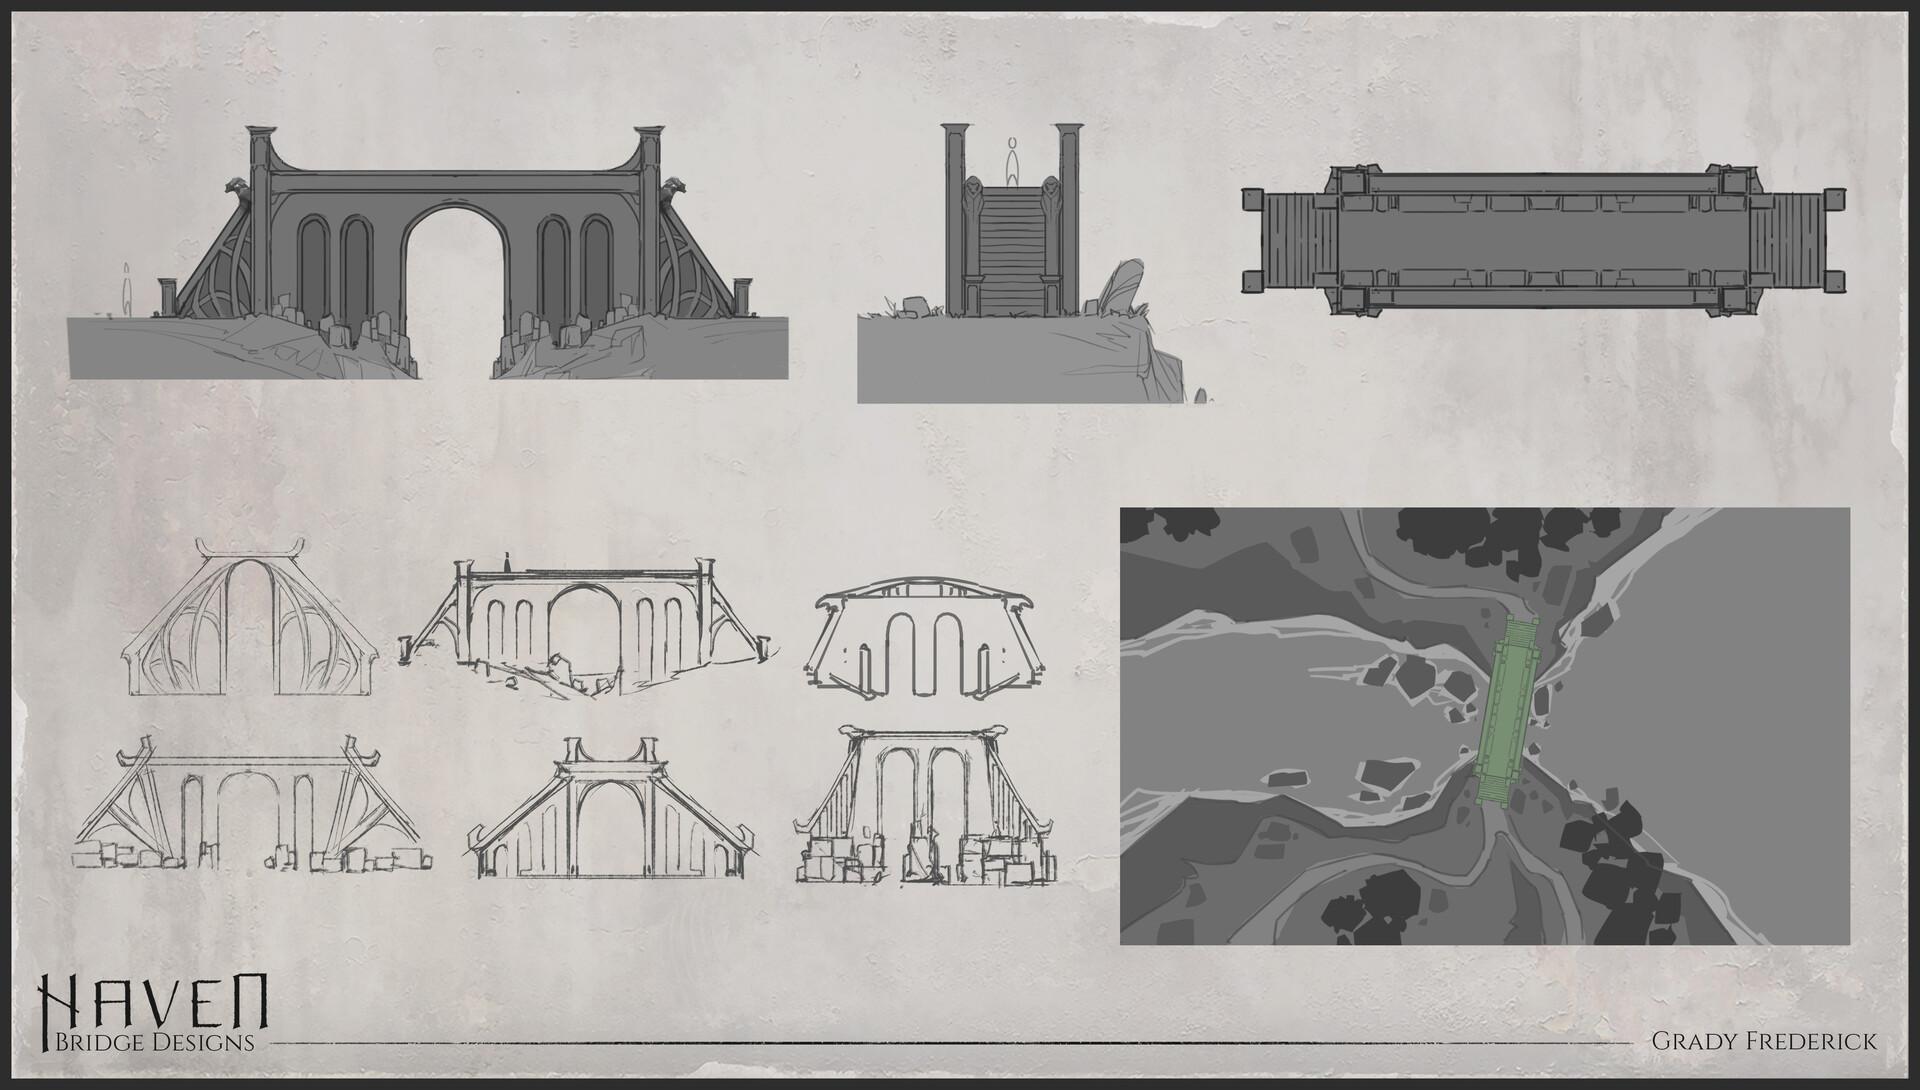 Grady frederick bridge sketches